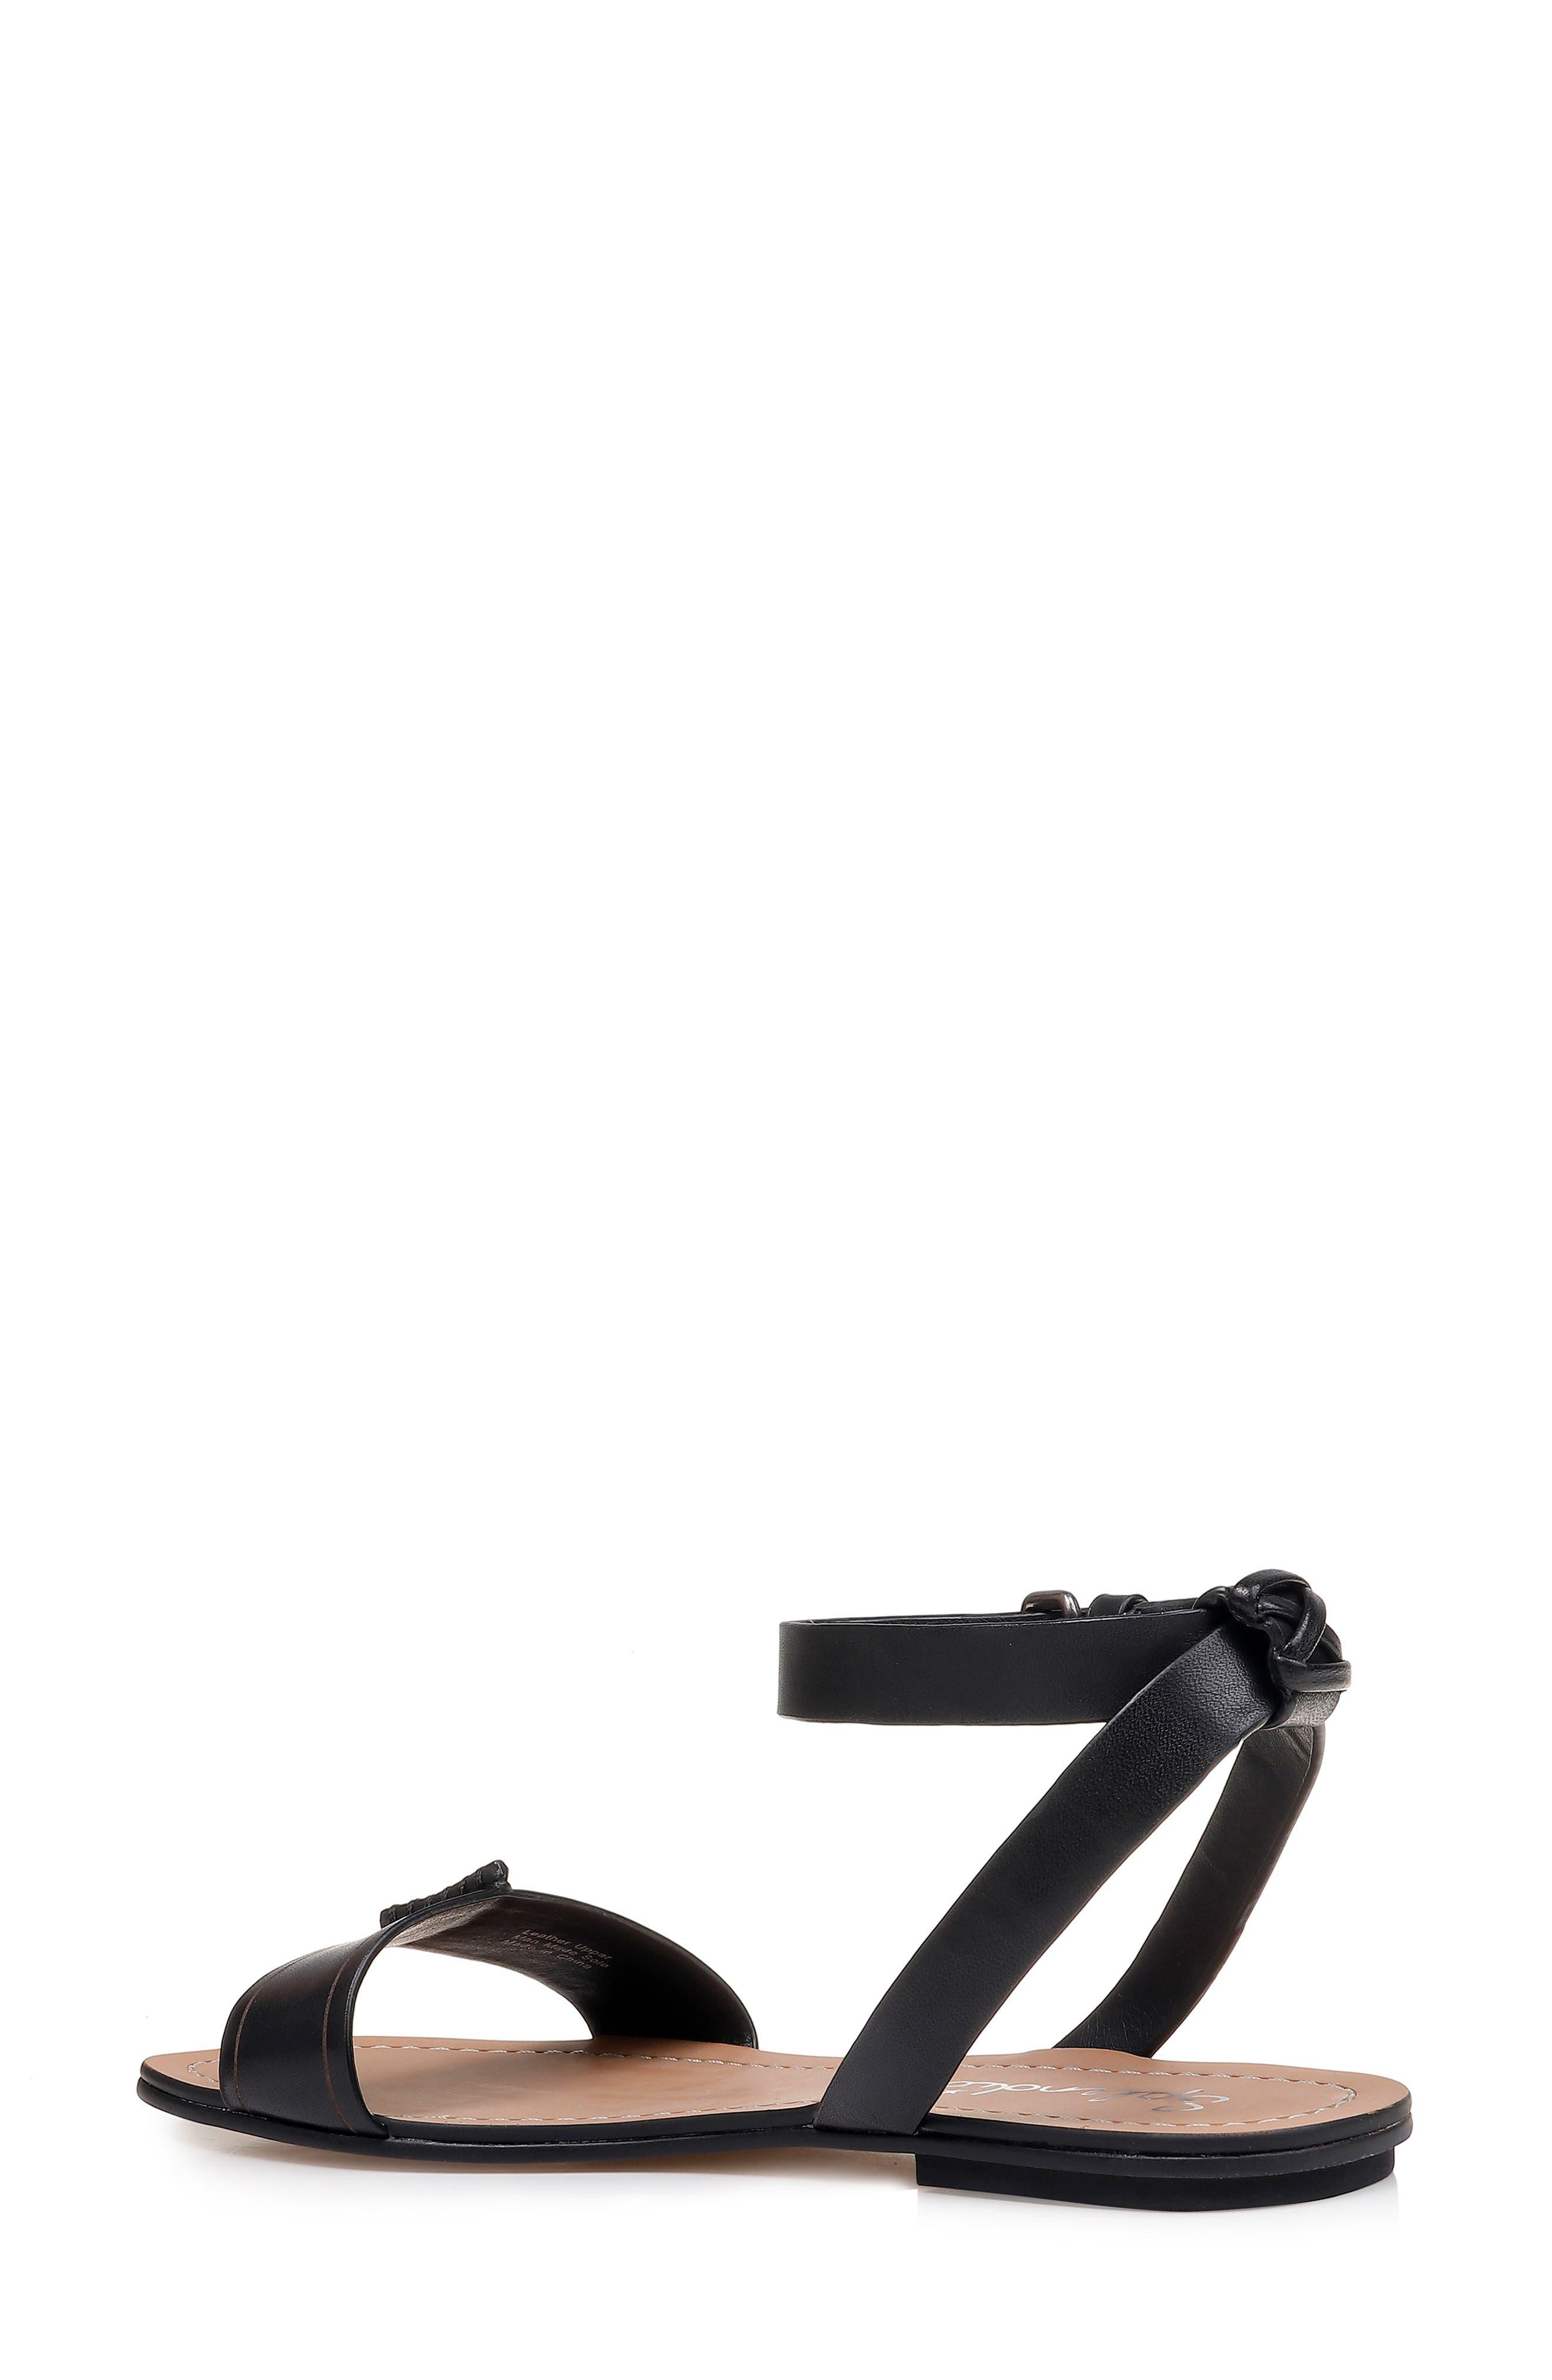 SPLENDID, Tabitha Ankle Strap Flat Sandal, Alternate thumbnail 2, color, BLACK LEATHER